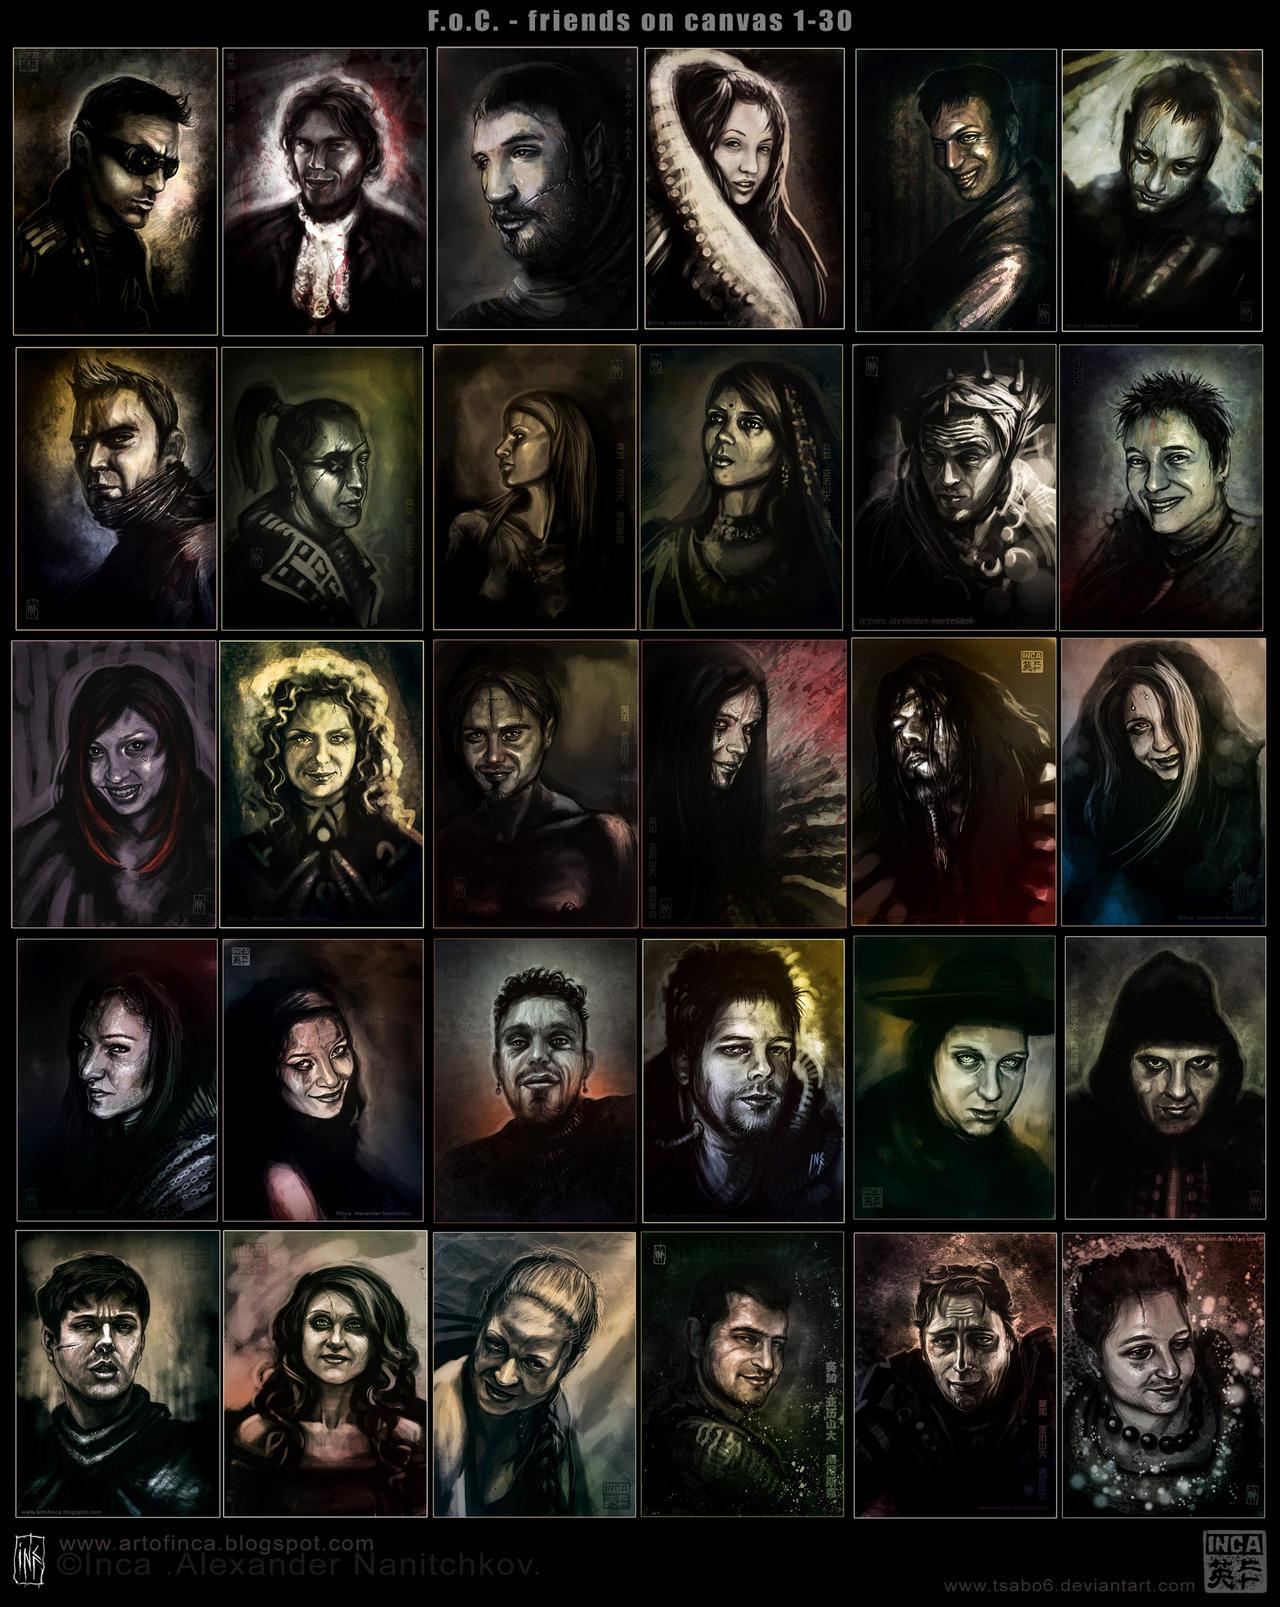 My Dark friends 1-30 by Tsabo6